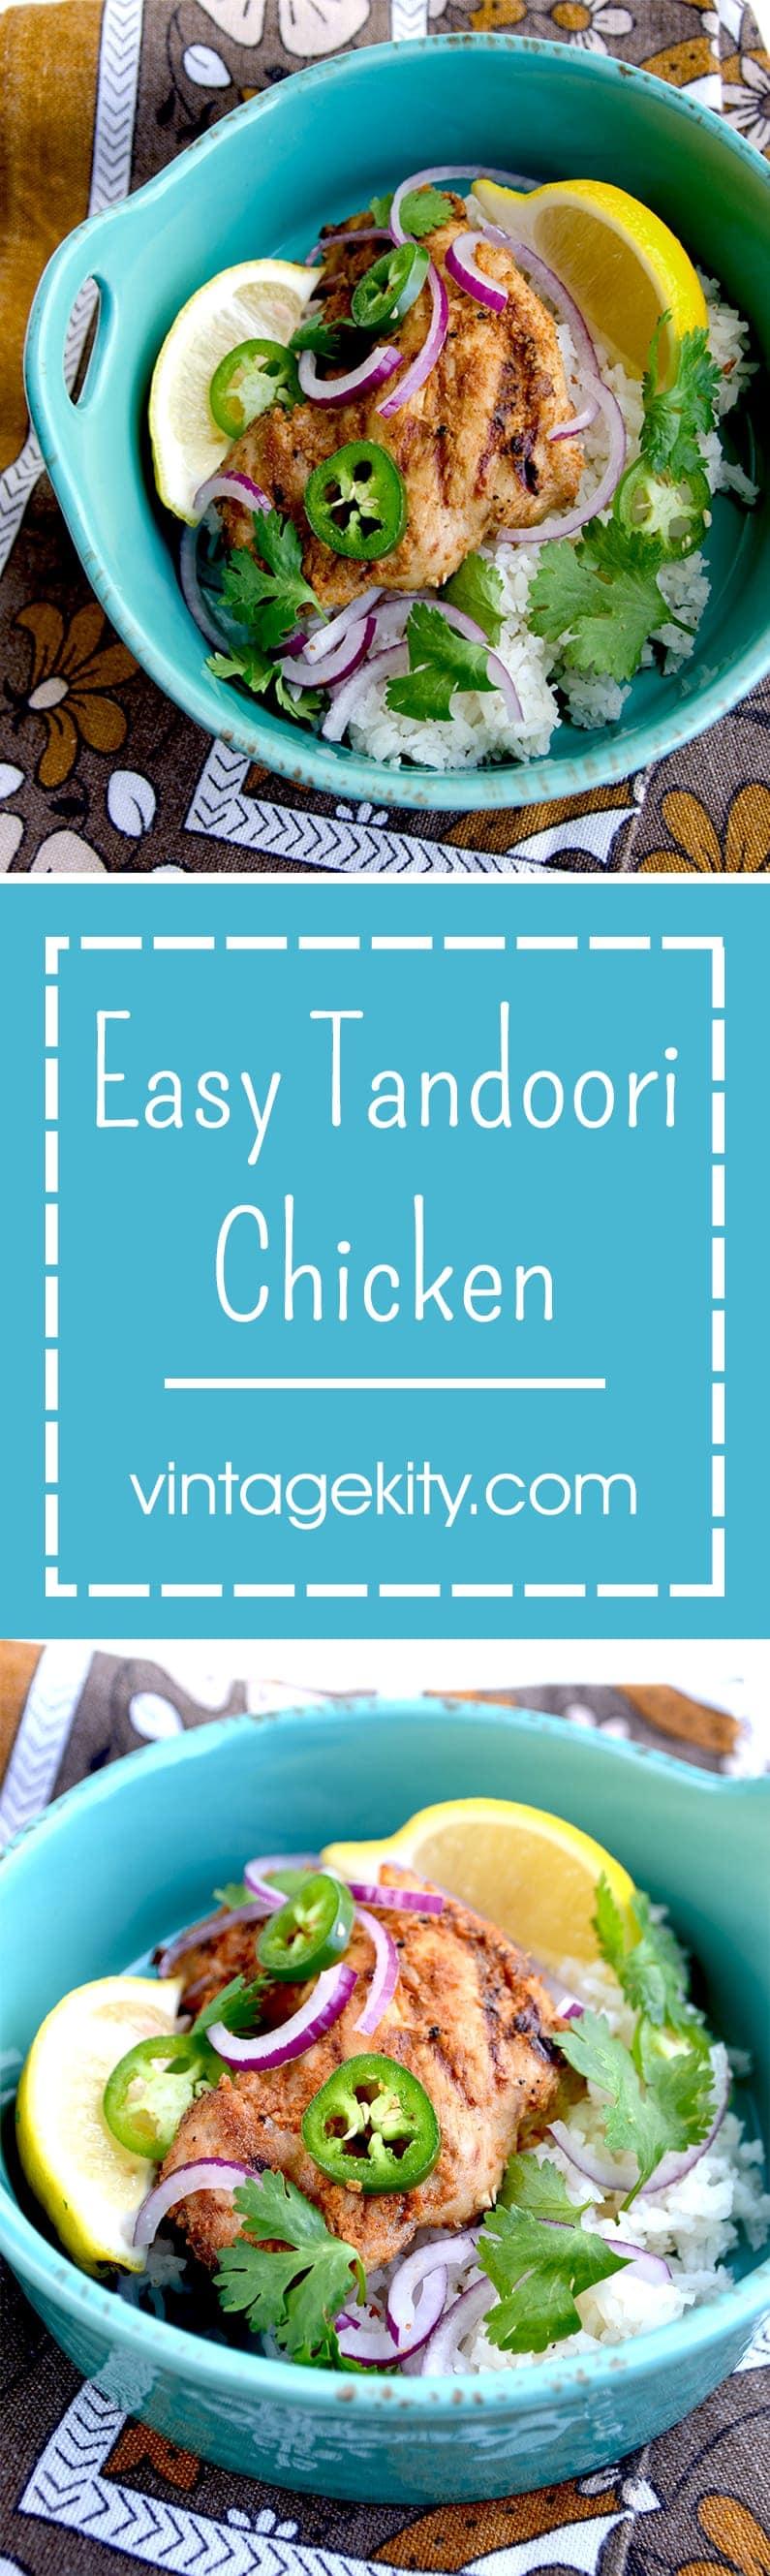 Easy Tandoori Chicken Pin - Easy Tandoori Chicken